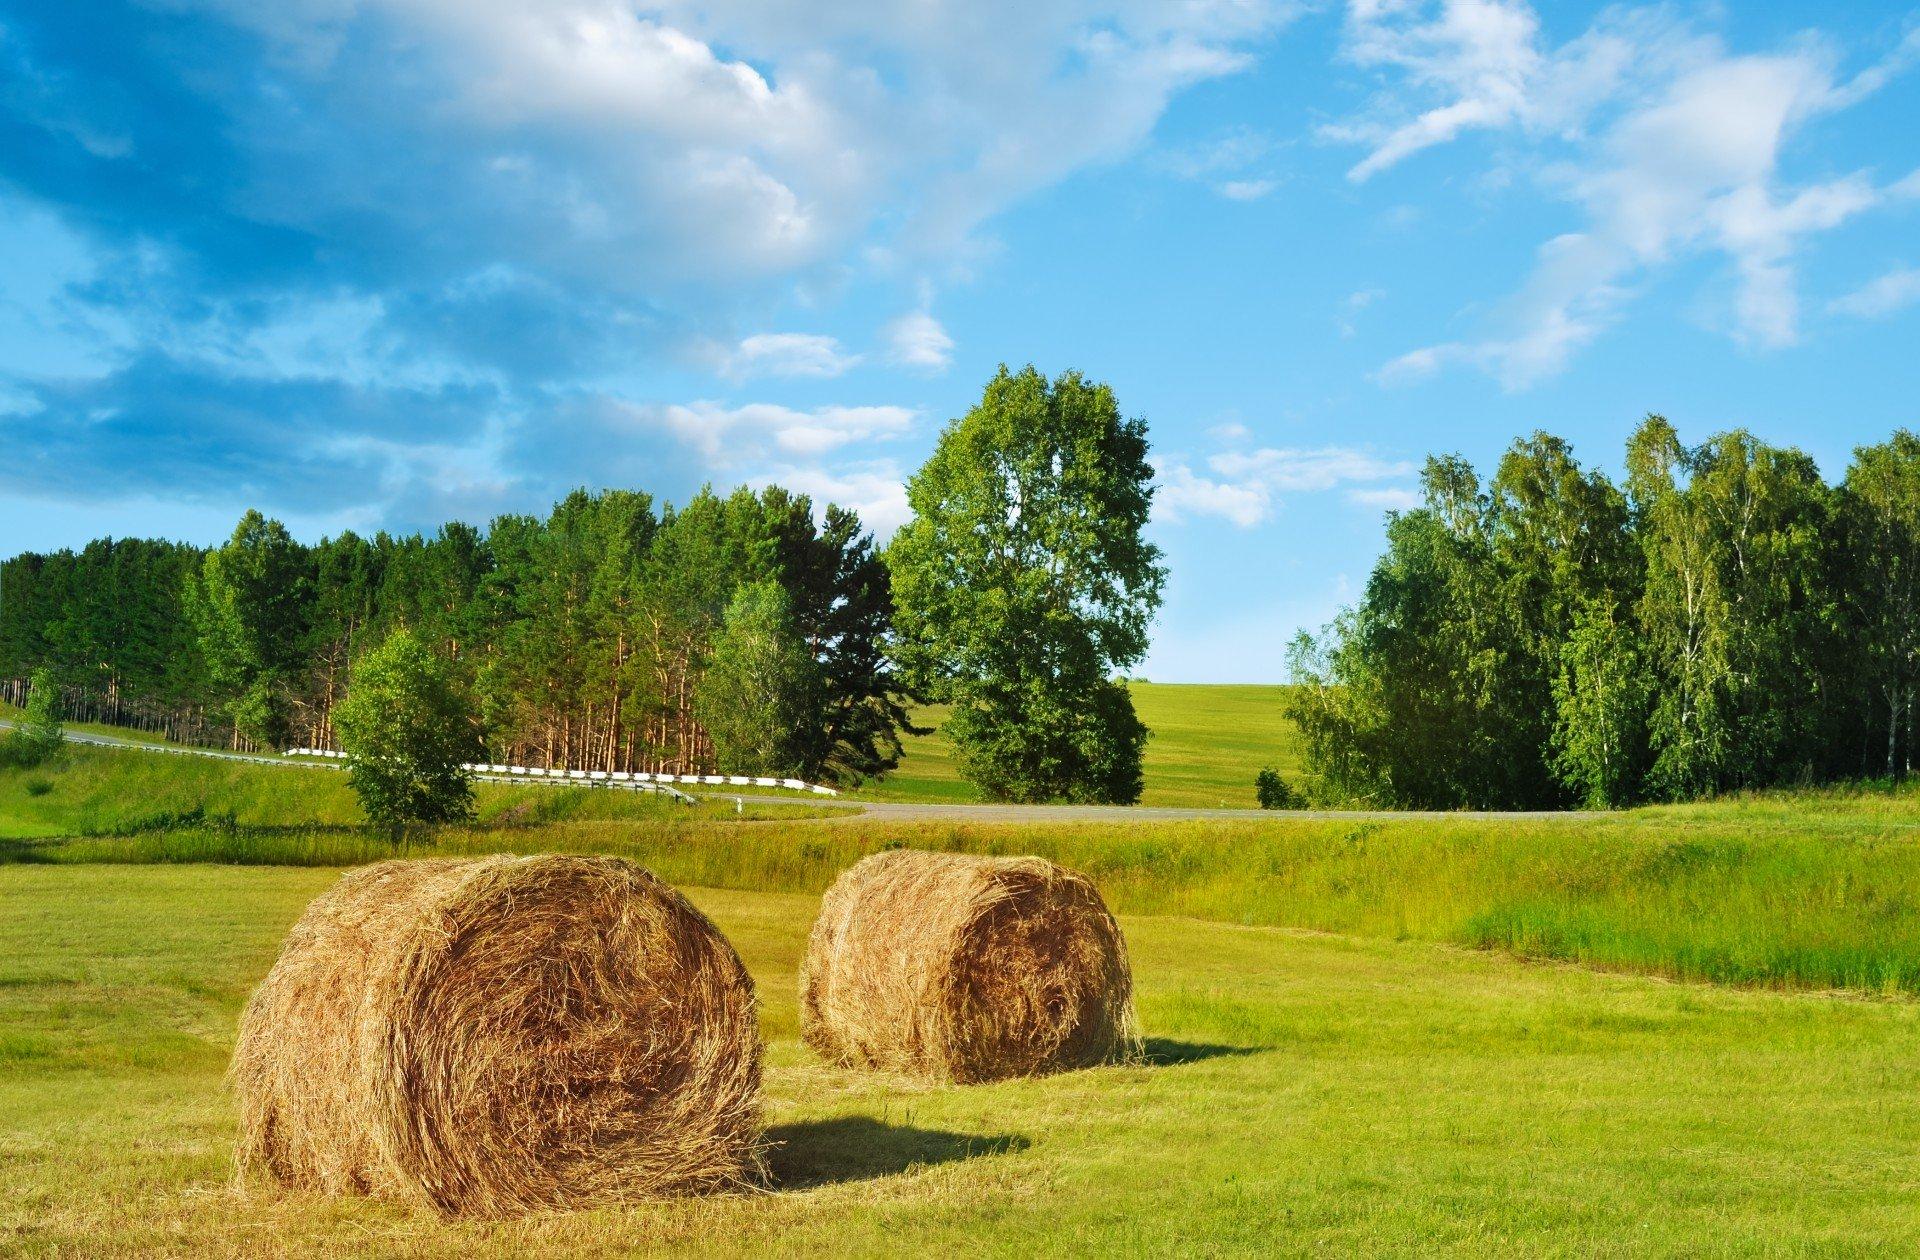 Farm Machinery Improvement Program